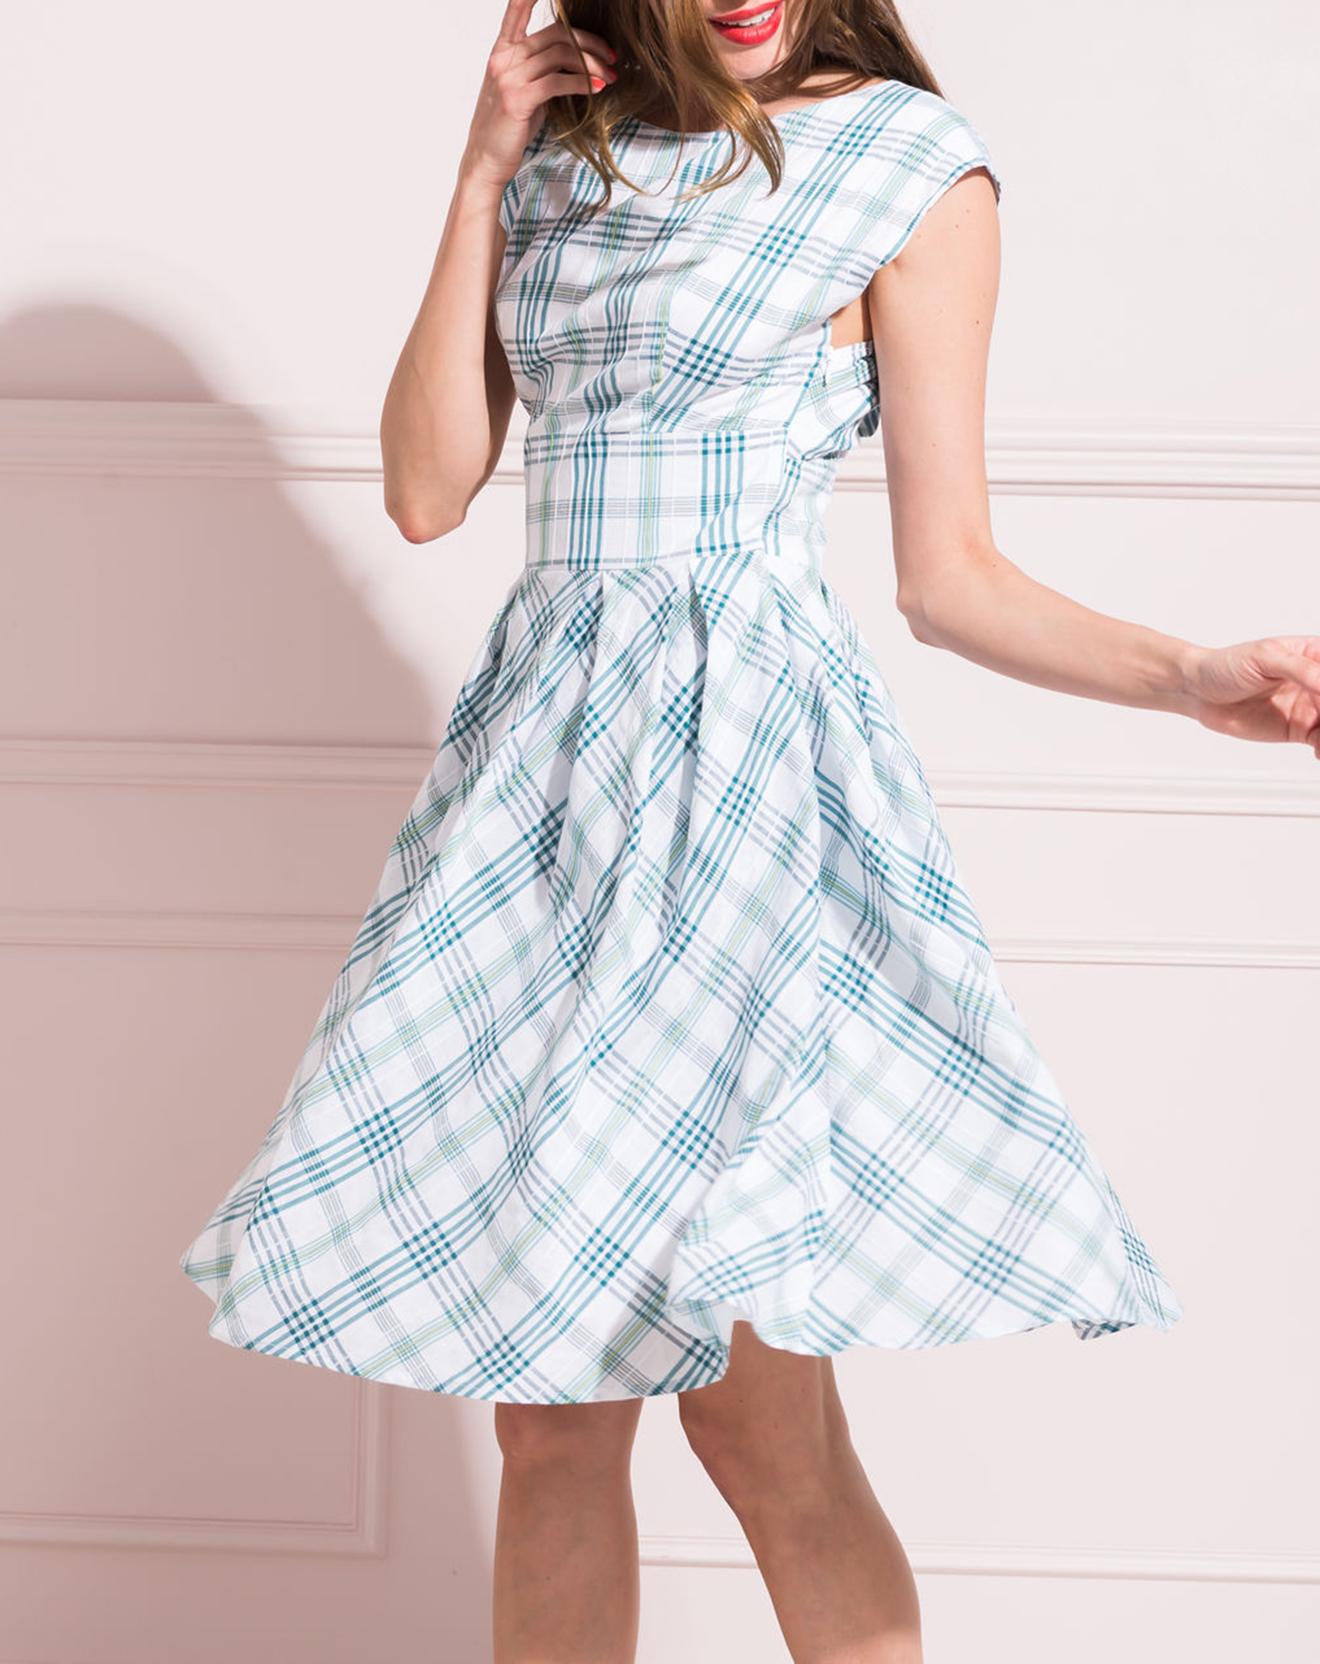 Robe Megane bleue - Caroll - Modalova